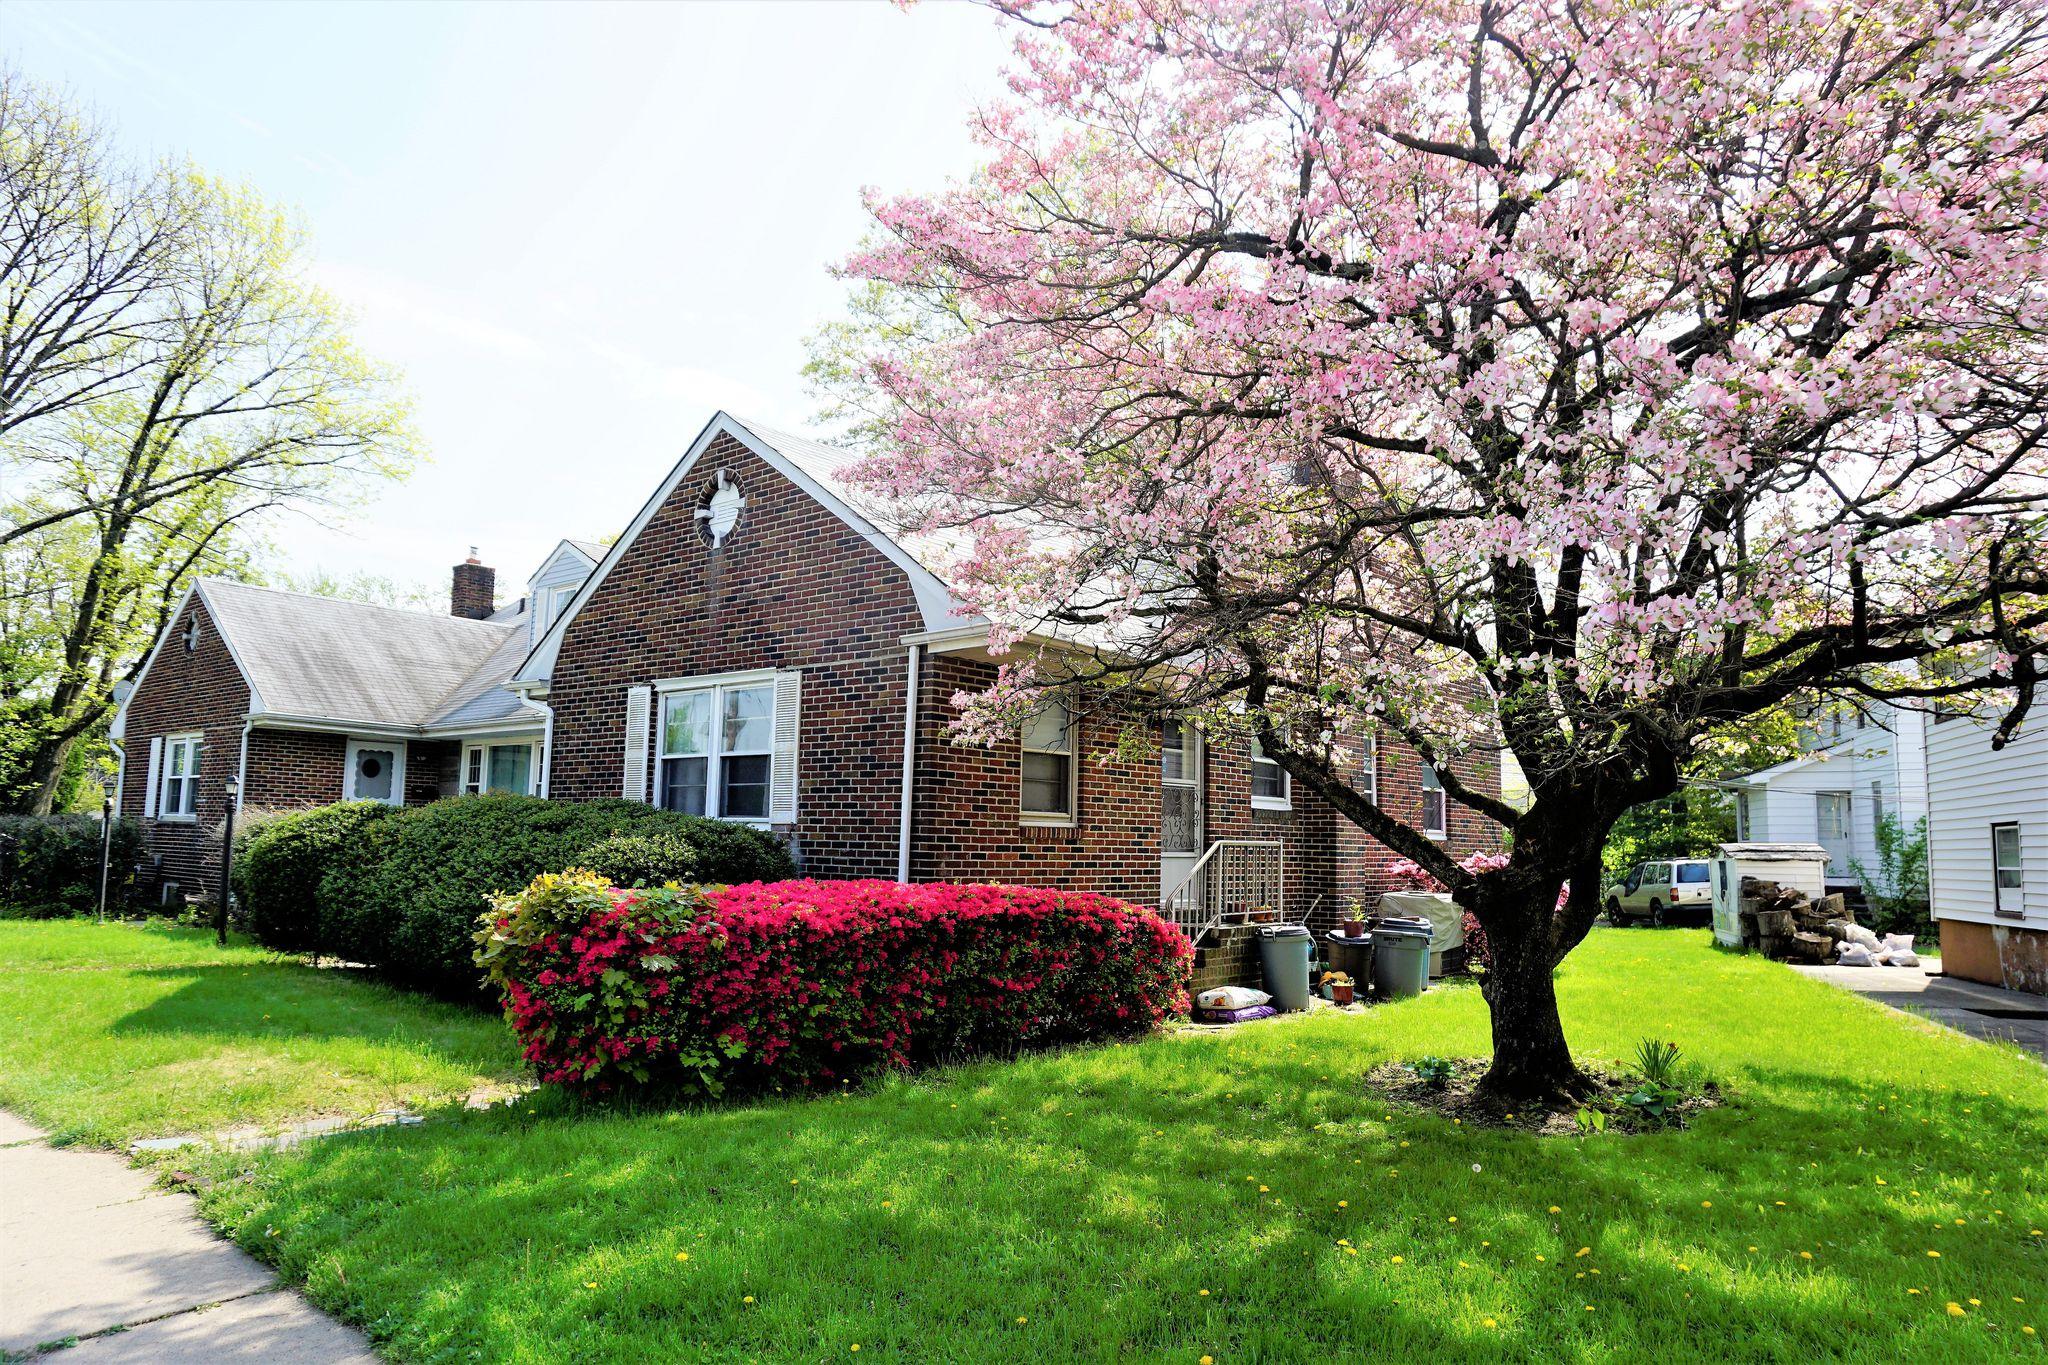 506 Irvington Ave #508, Maplewood, NJ 07040   3 Bed, 2 Bath Single Family  Home   MLS #3561263   25 Photos   Trulia